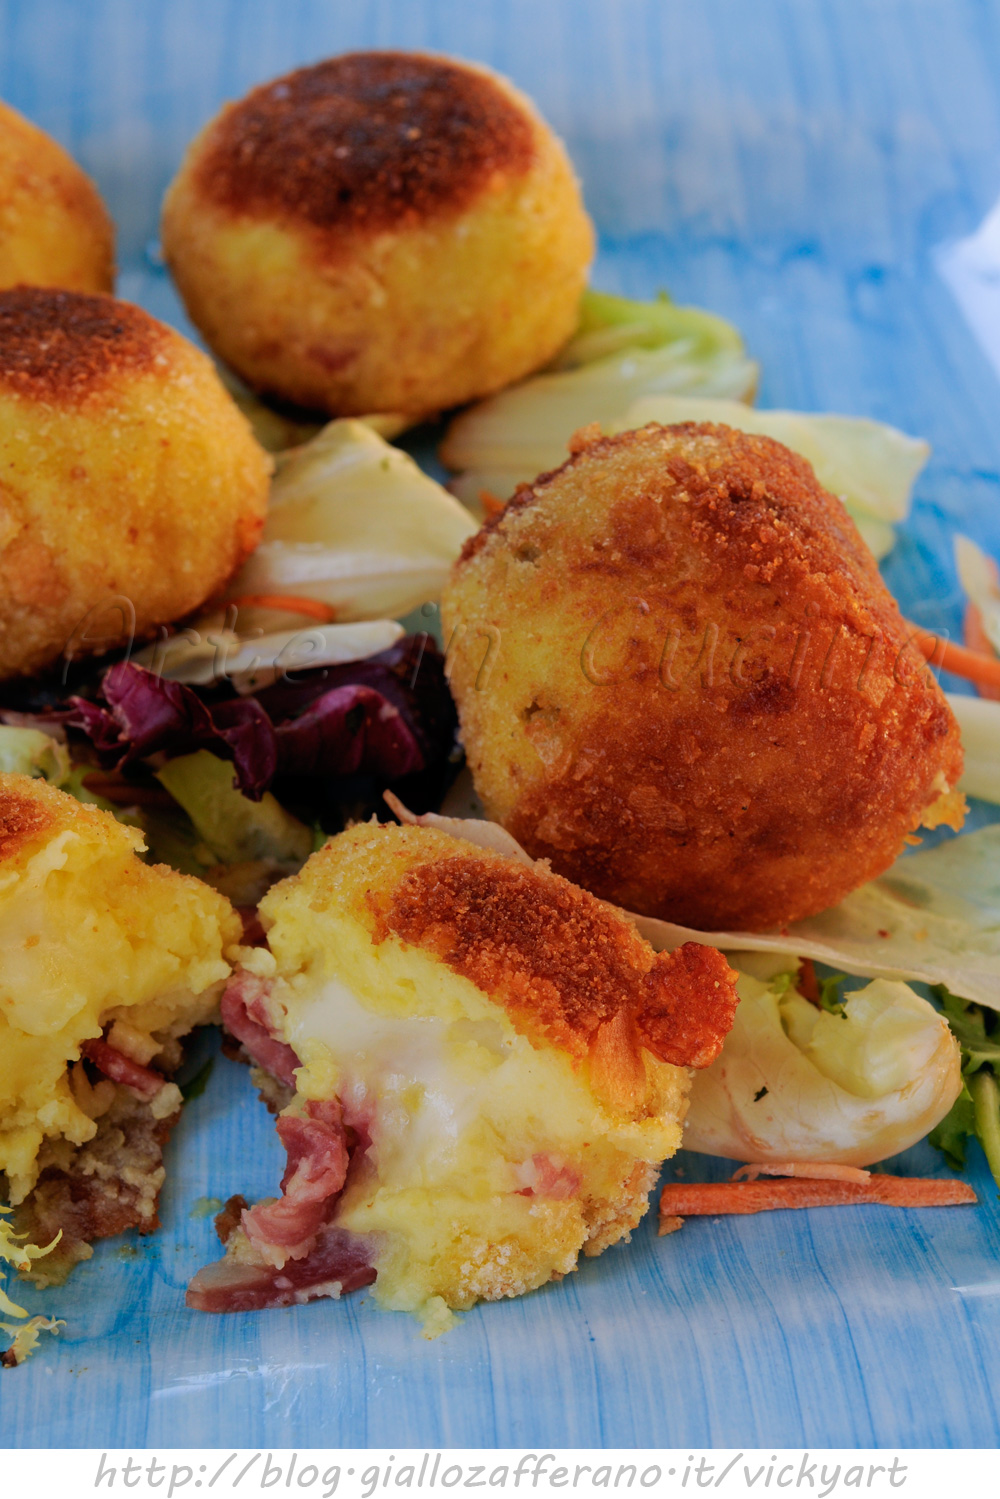 Bomboloni di patate olive e salame ricetta sfiziosa vickyart arte in cucina